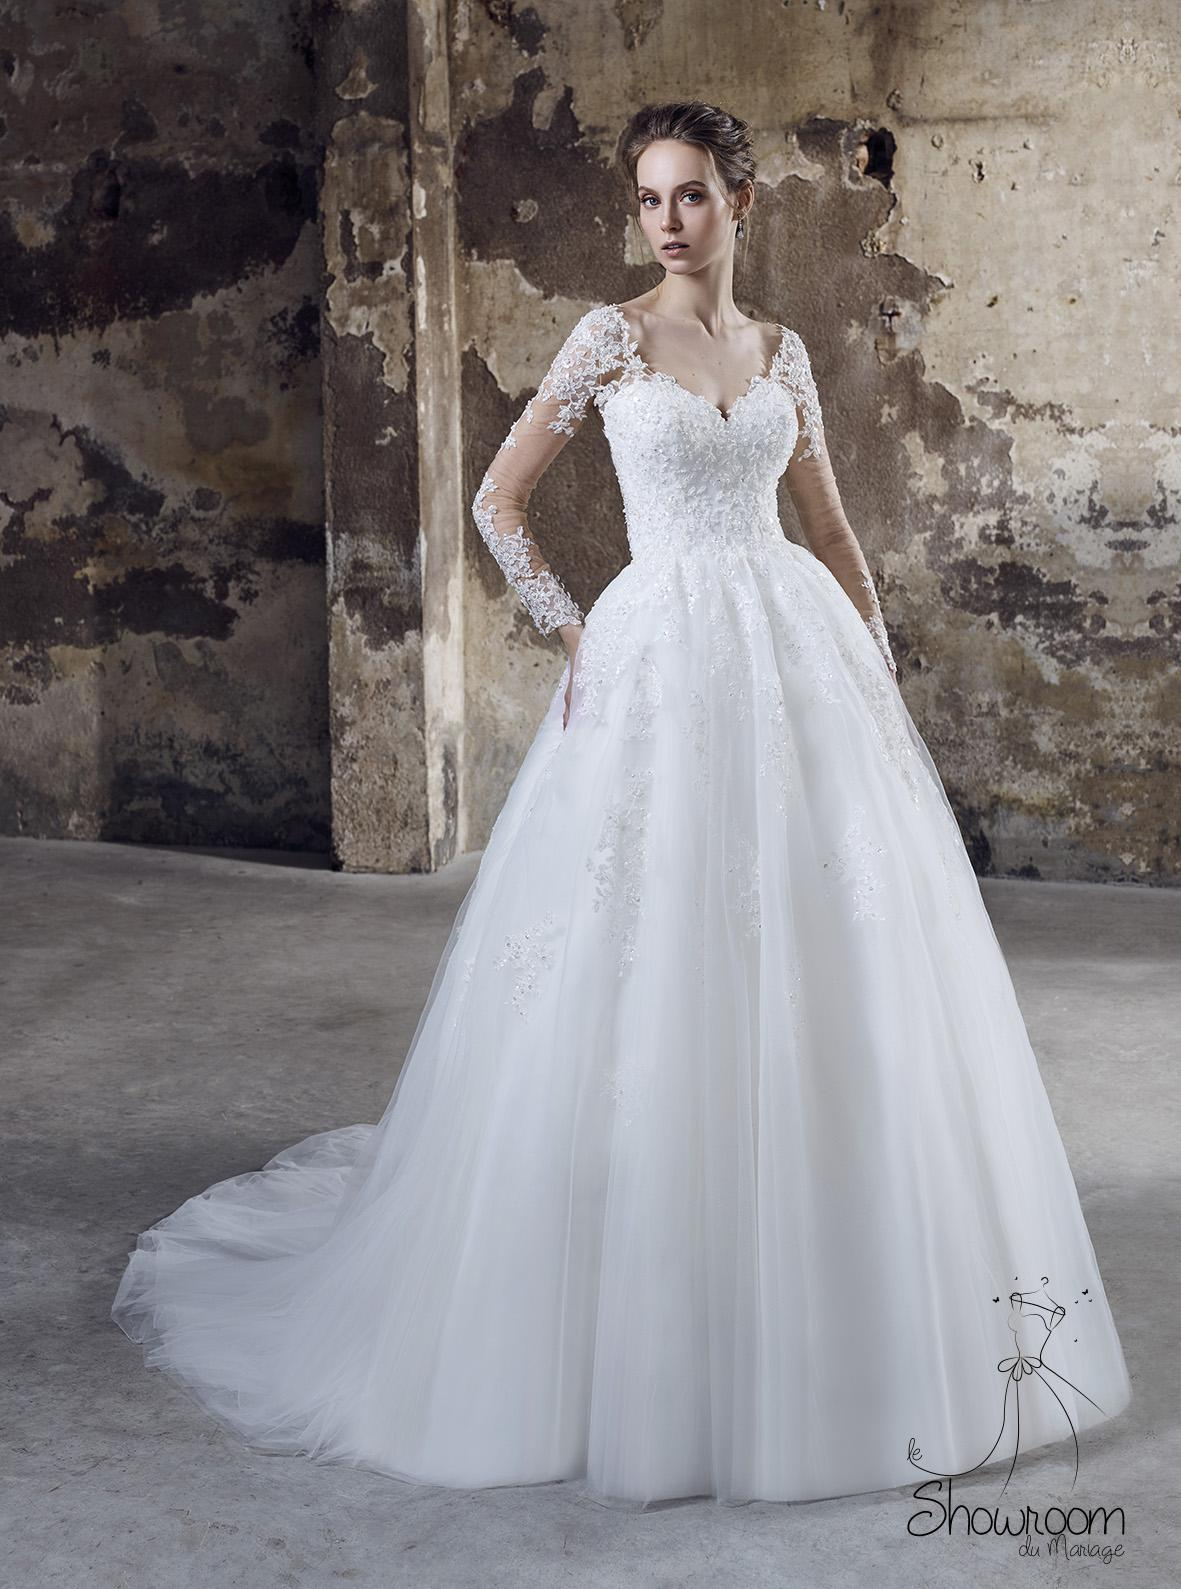 Robes de mariée 201-09 : 1249€